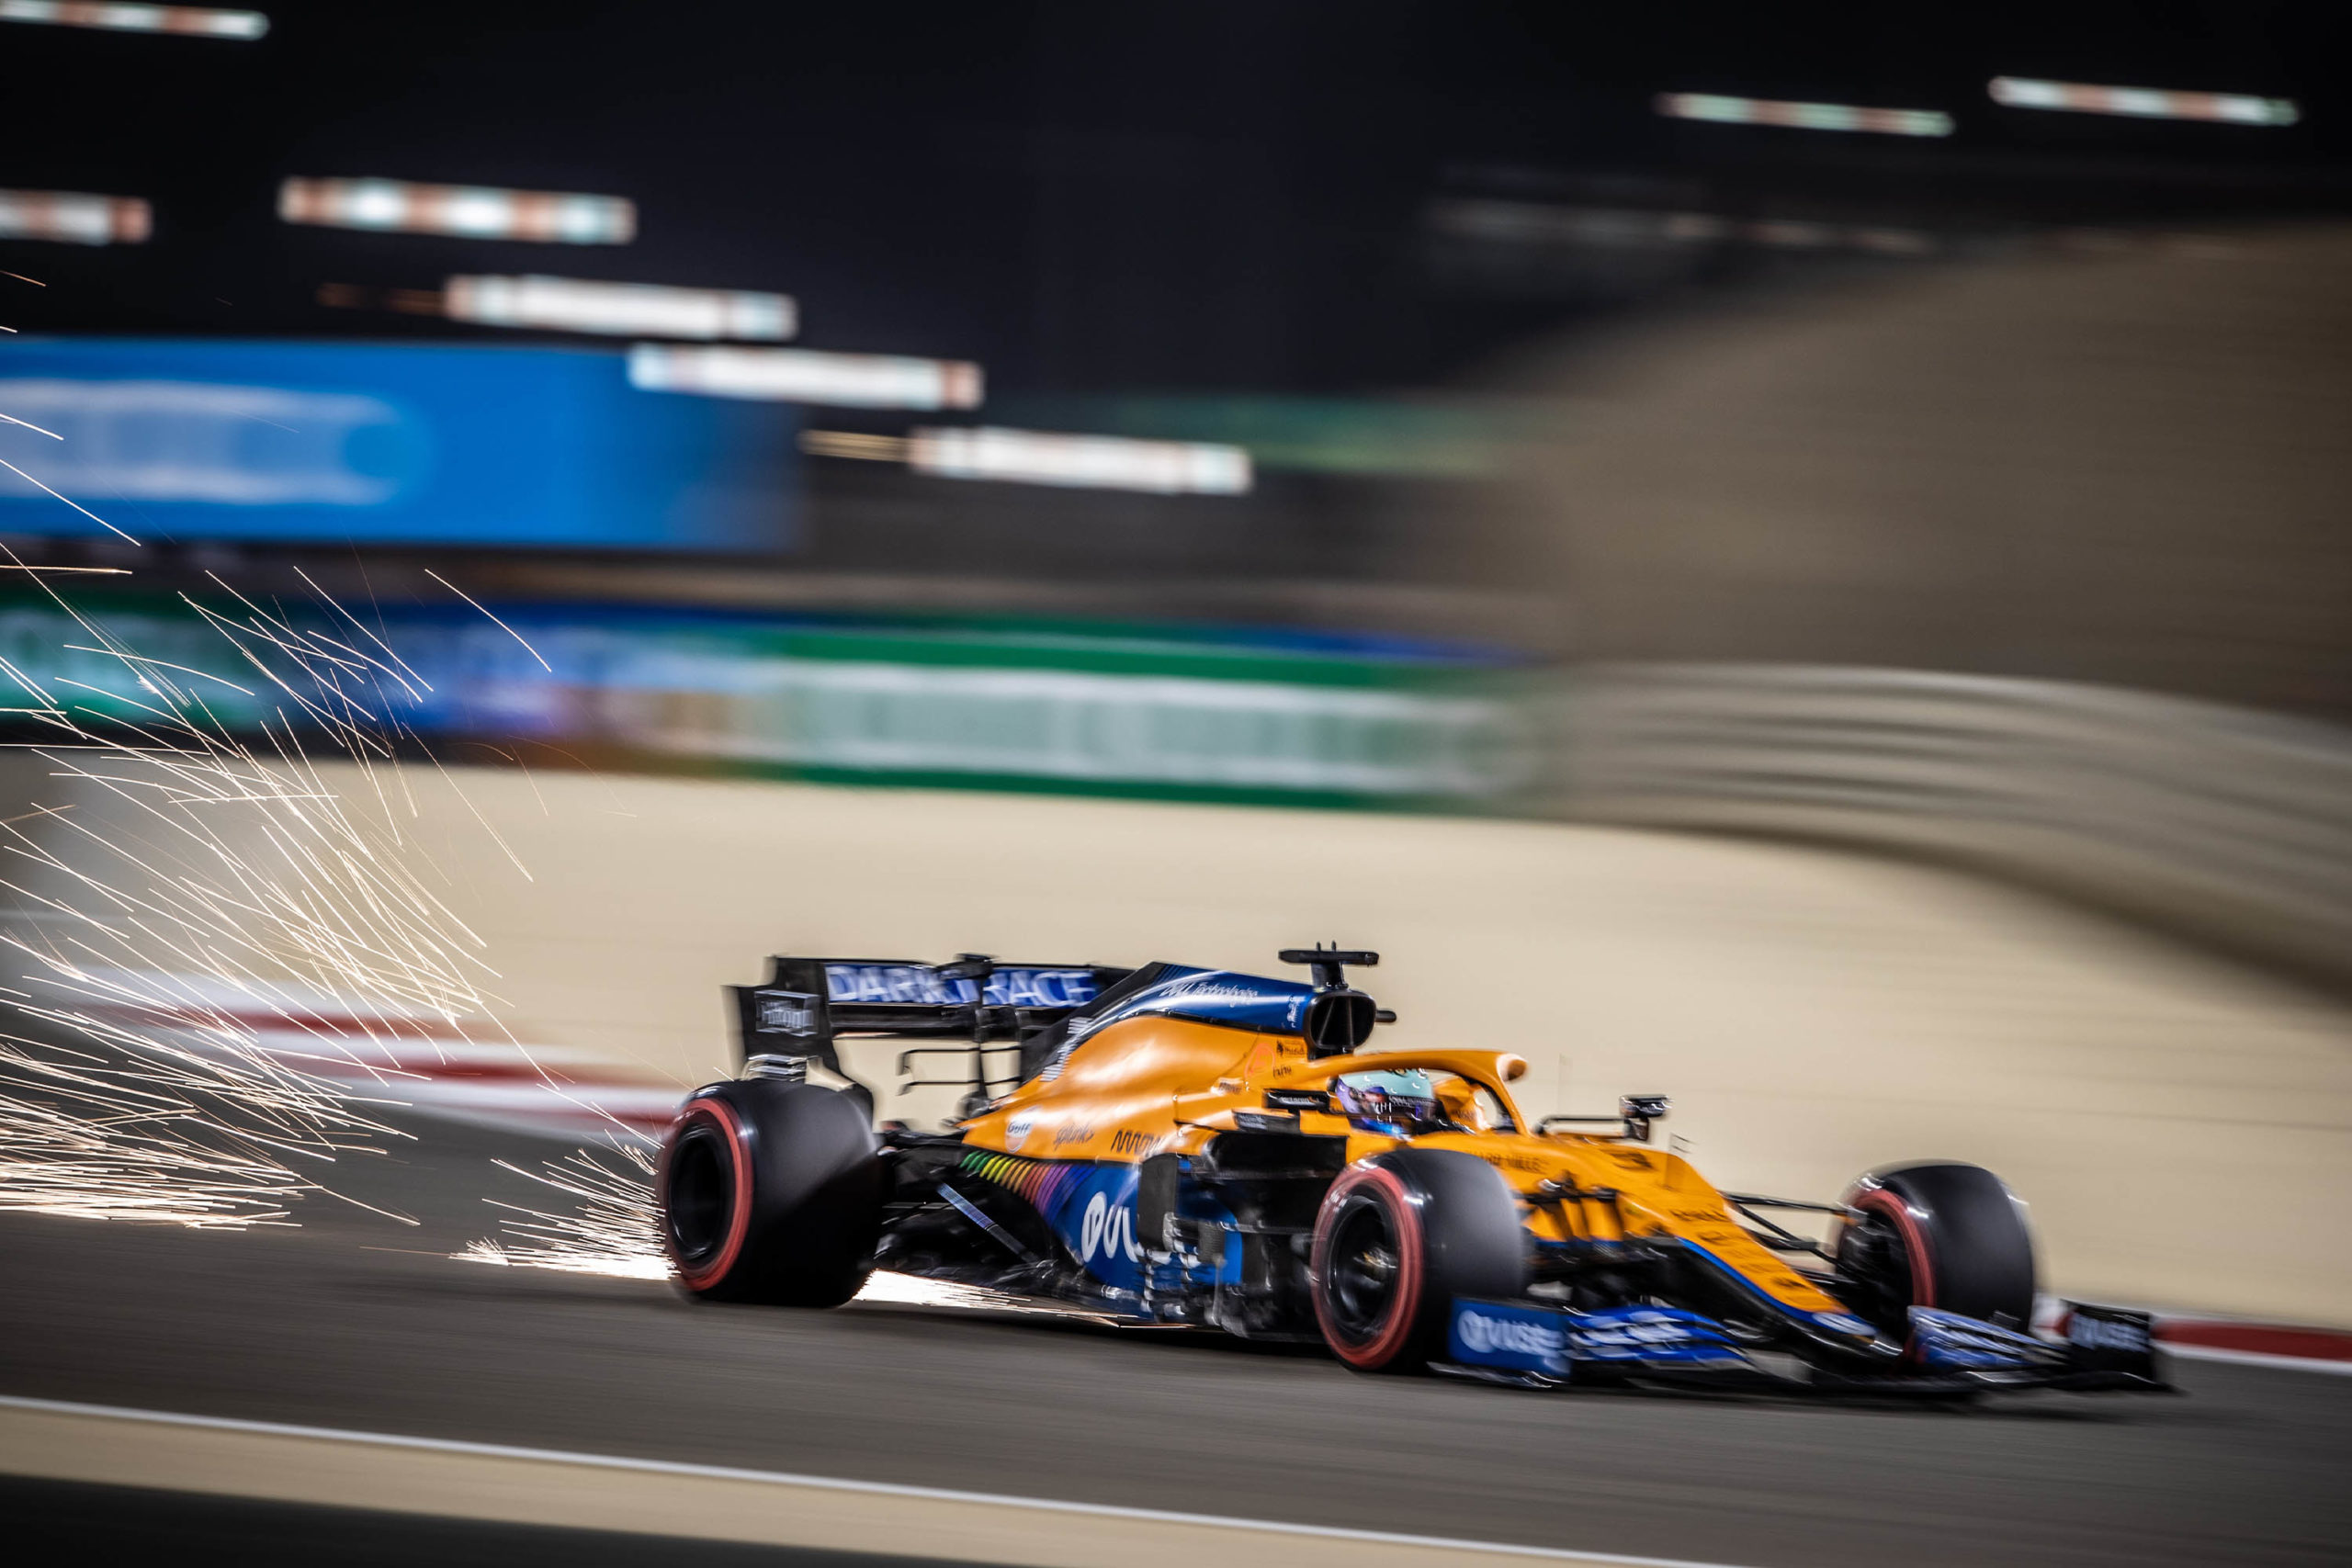 'F1 shaping up to be pretty awesome' says Daniel Ricciardo